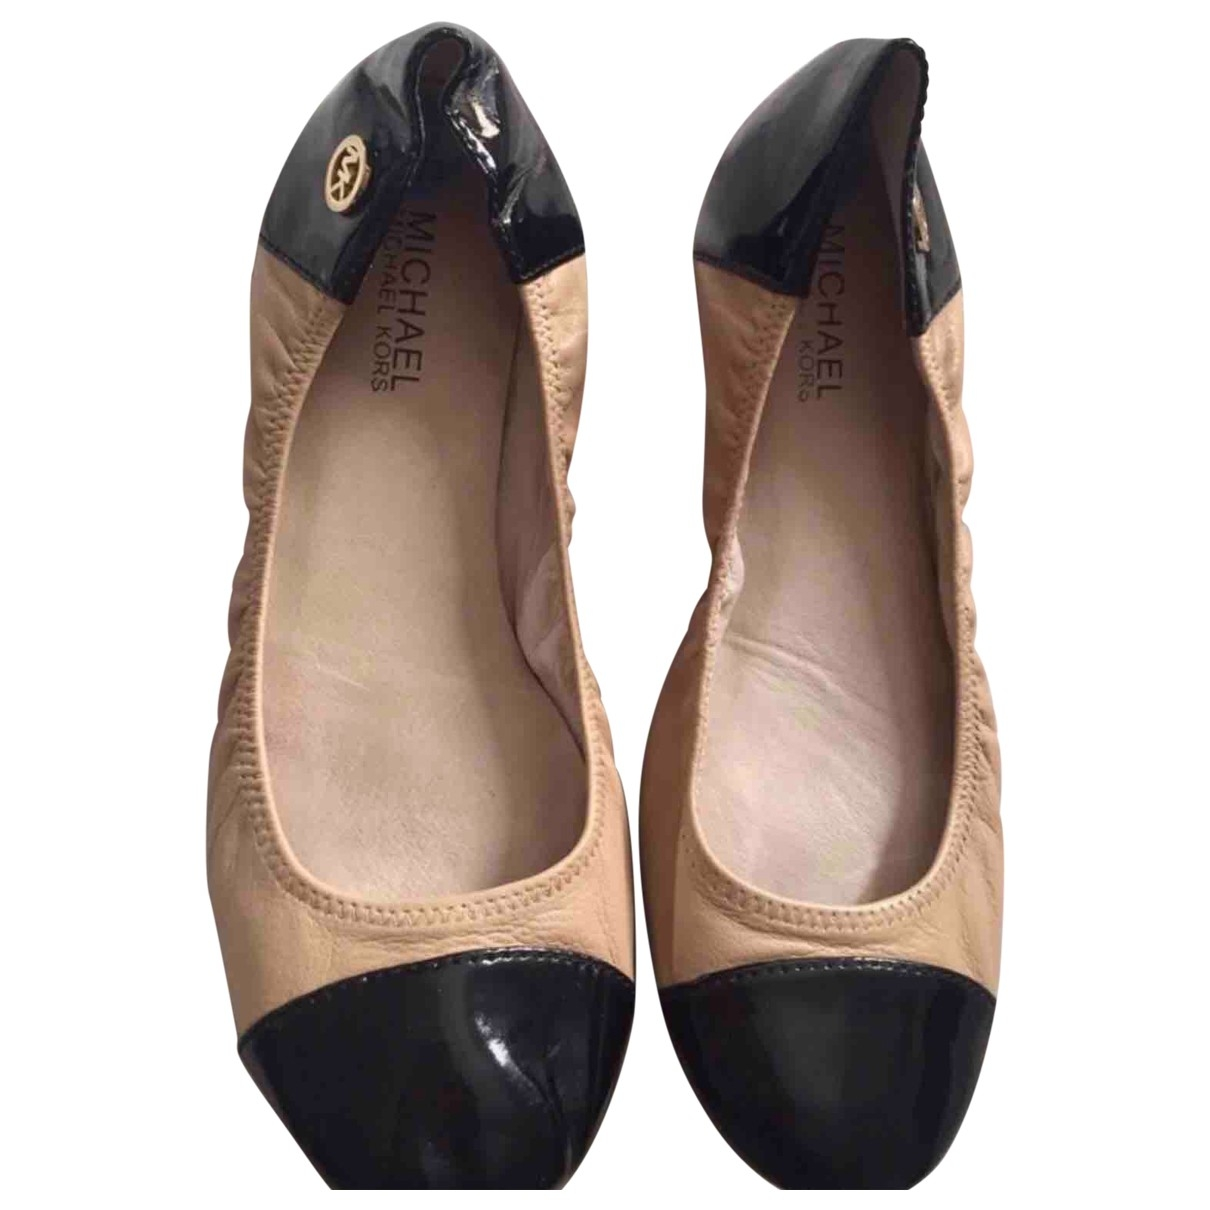 Michael Kors - Ballerines   pour femme en cuir - beige